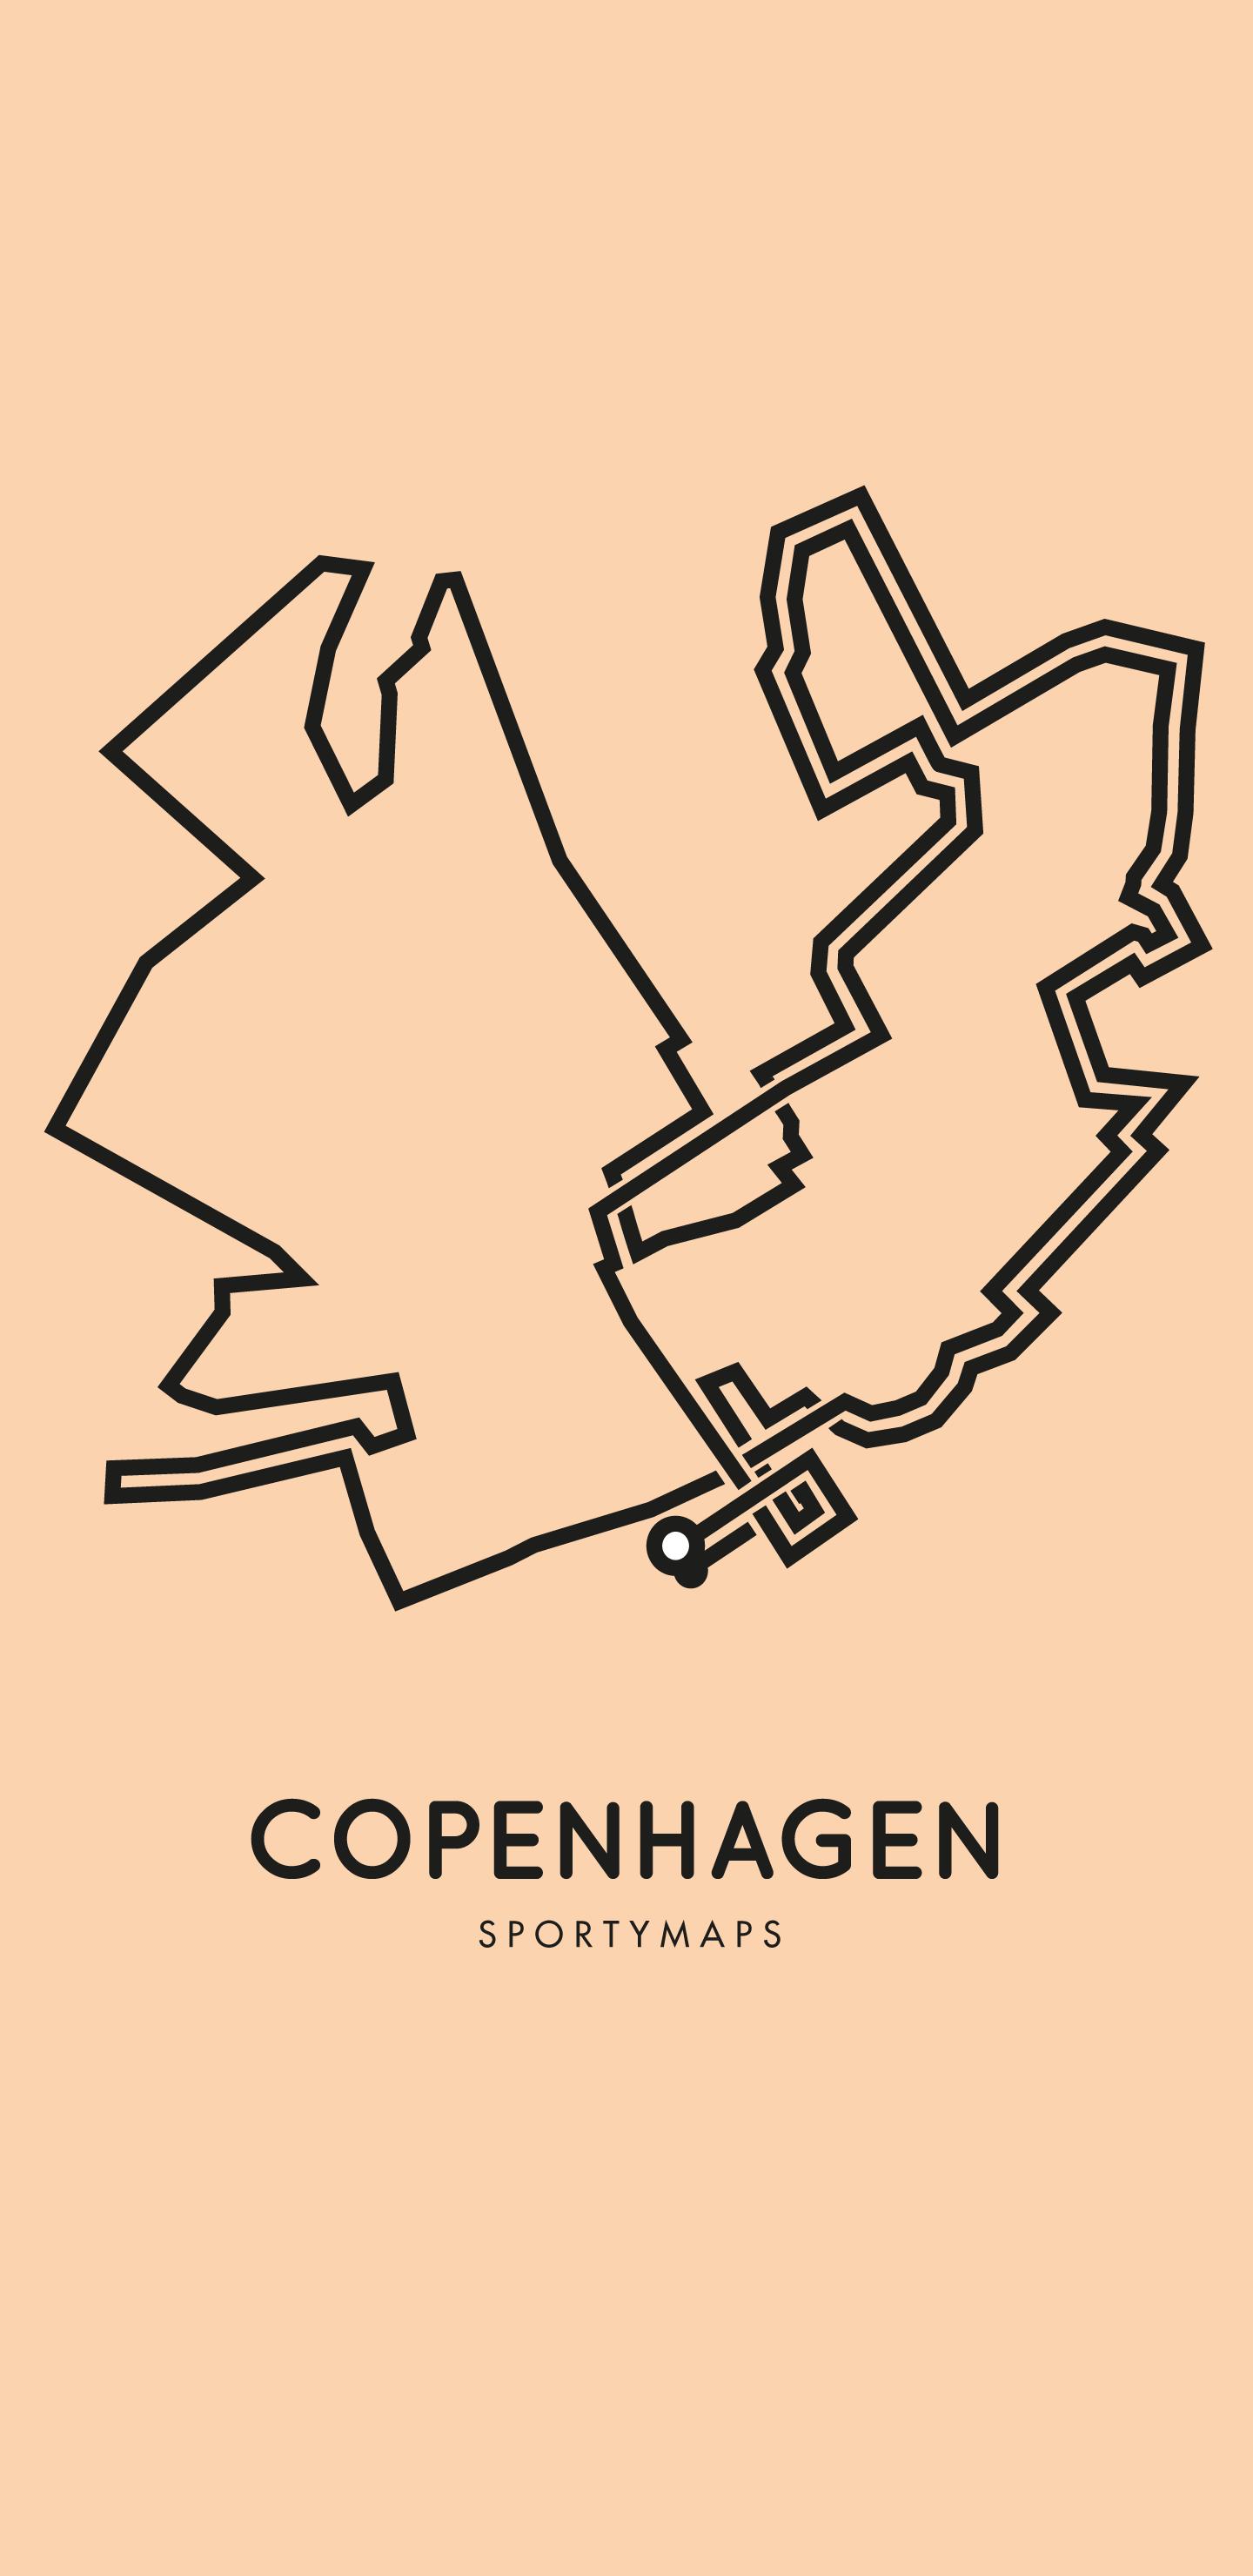 Sportymaps-Copenhagen-marathon-orange